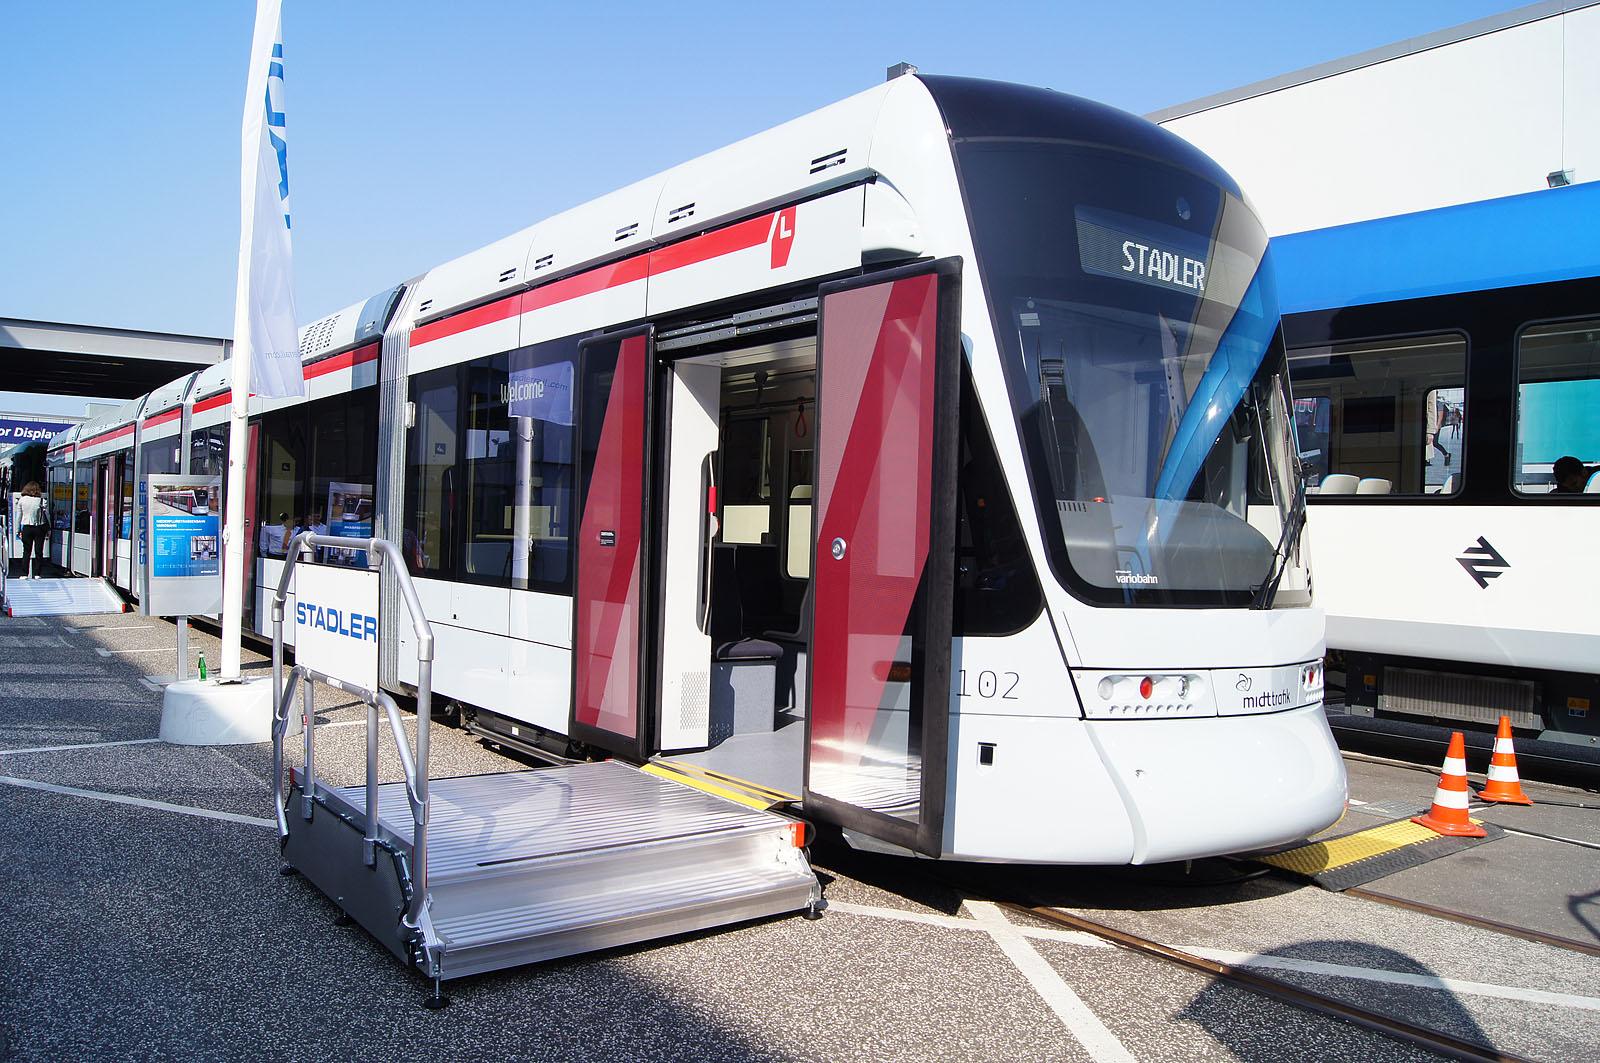 [DK] In the picture: Variobahn for the Aarhus Letbane network